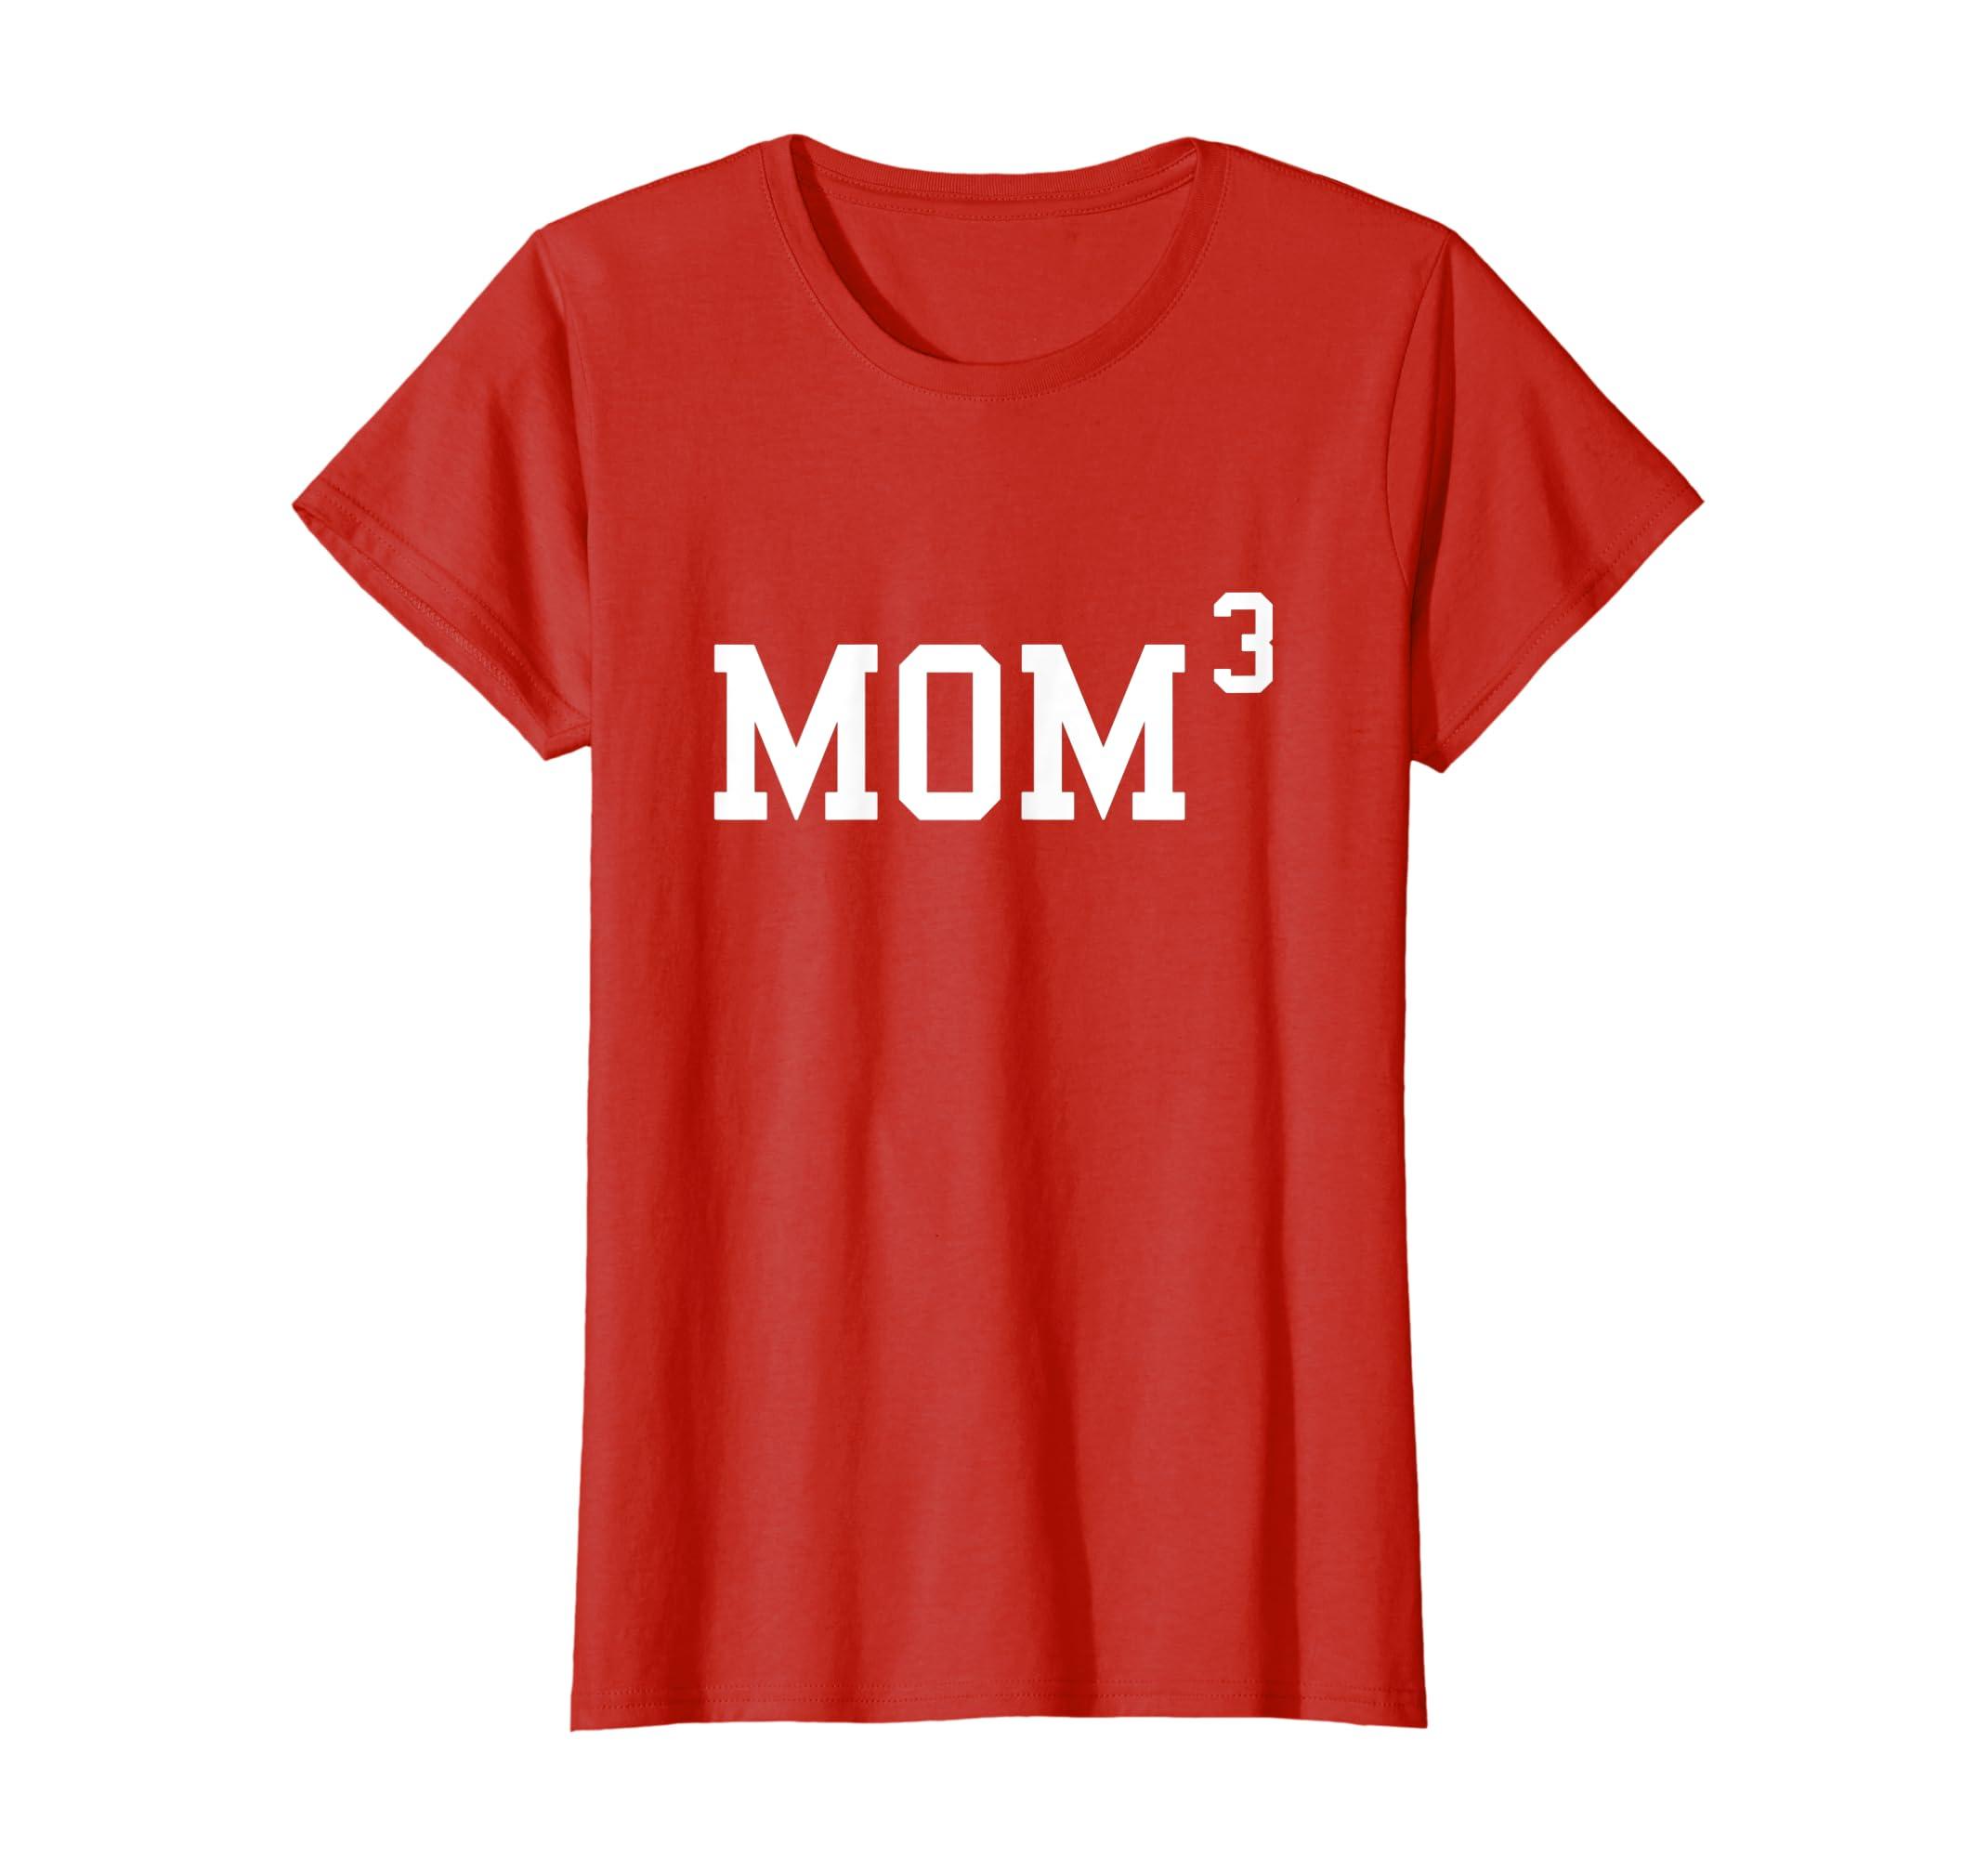 Womens Mom3 T-Shirt - Funny Mom Of 3 Gift Tee Shirt